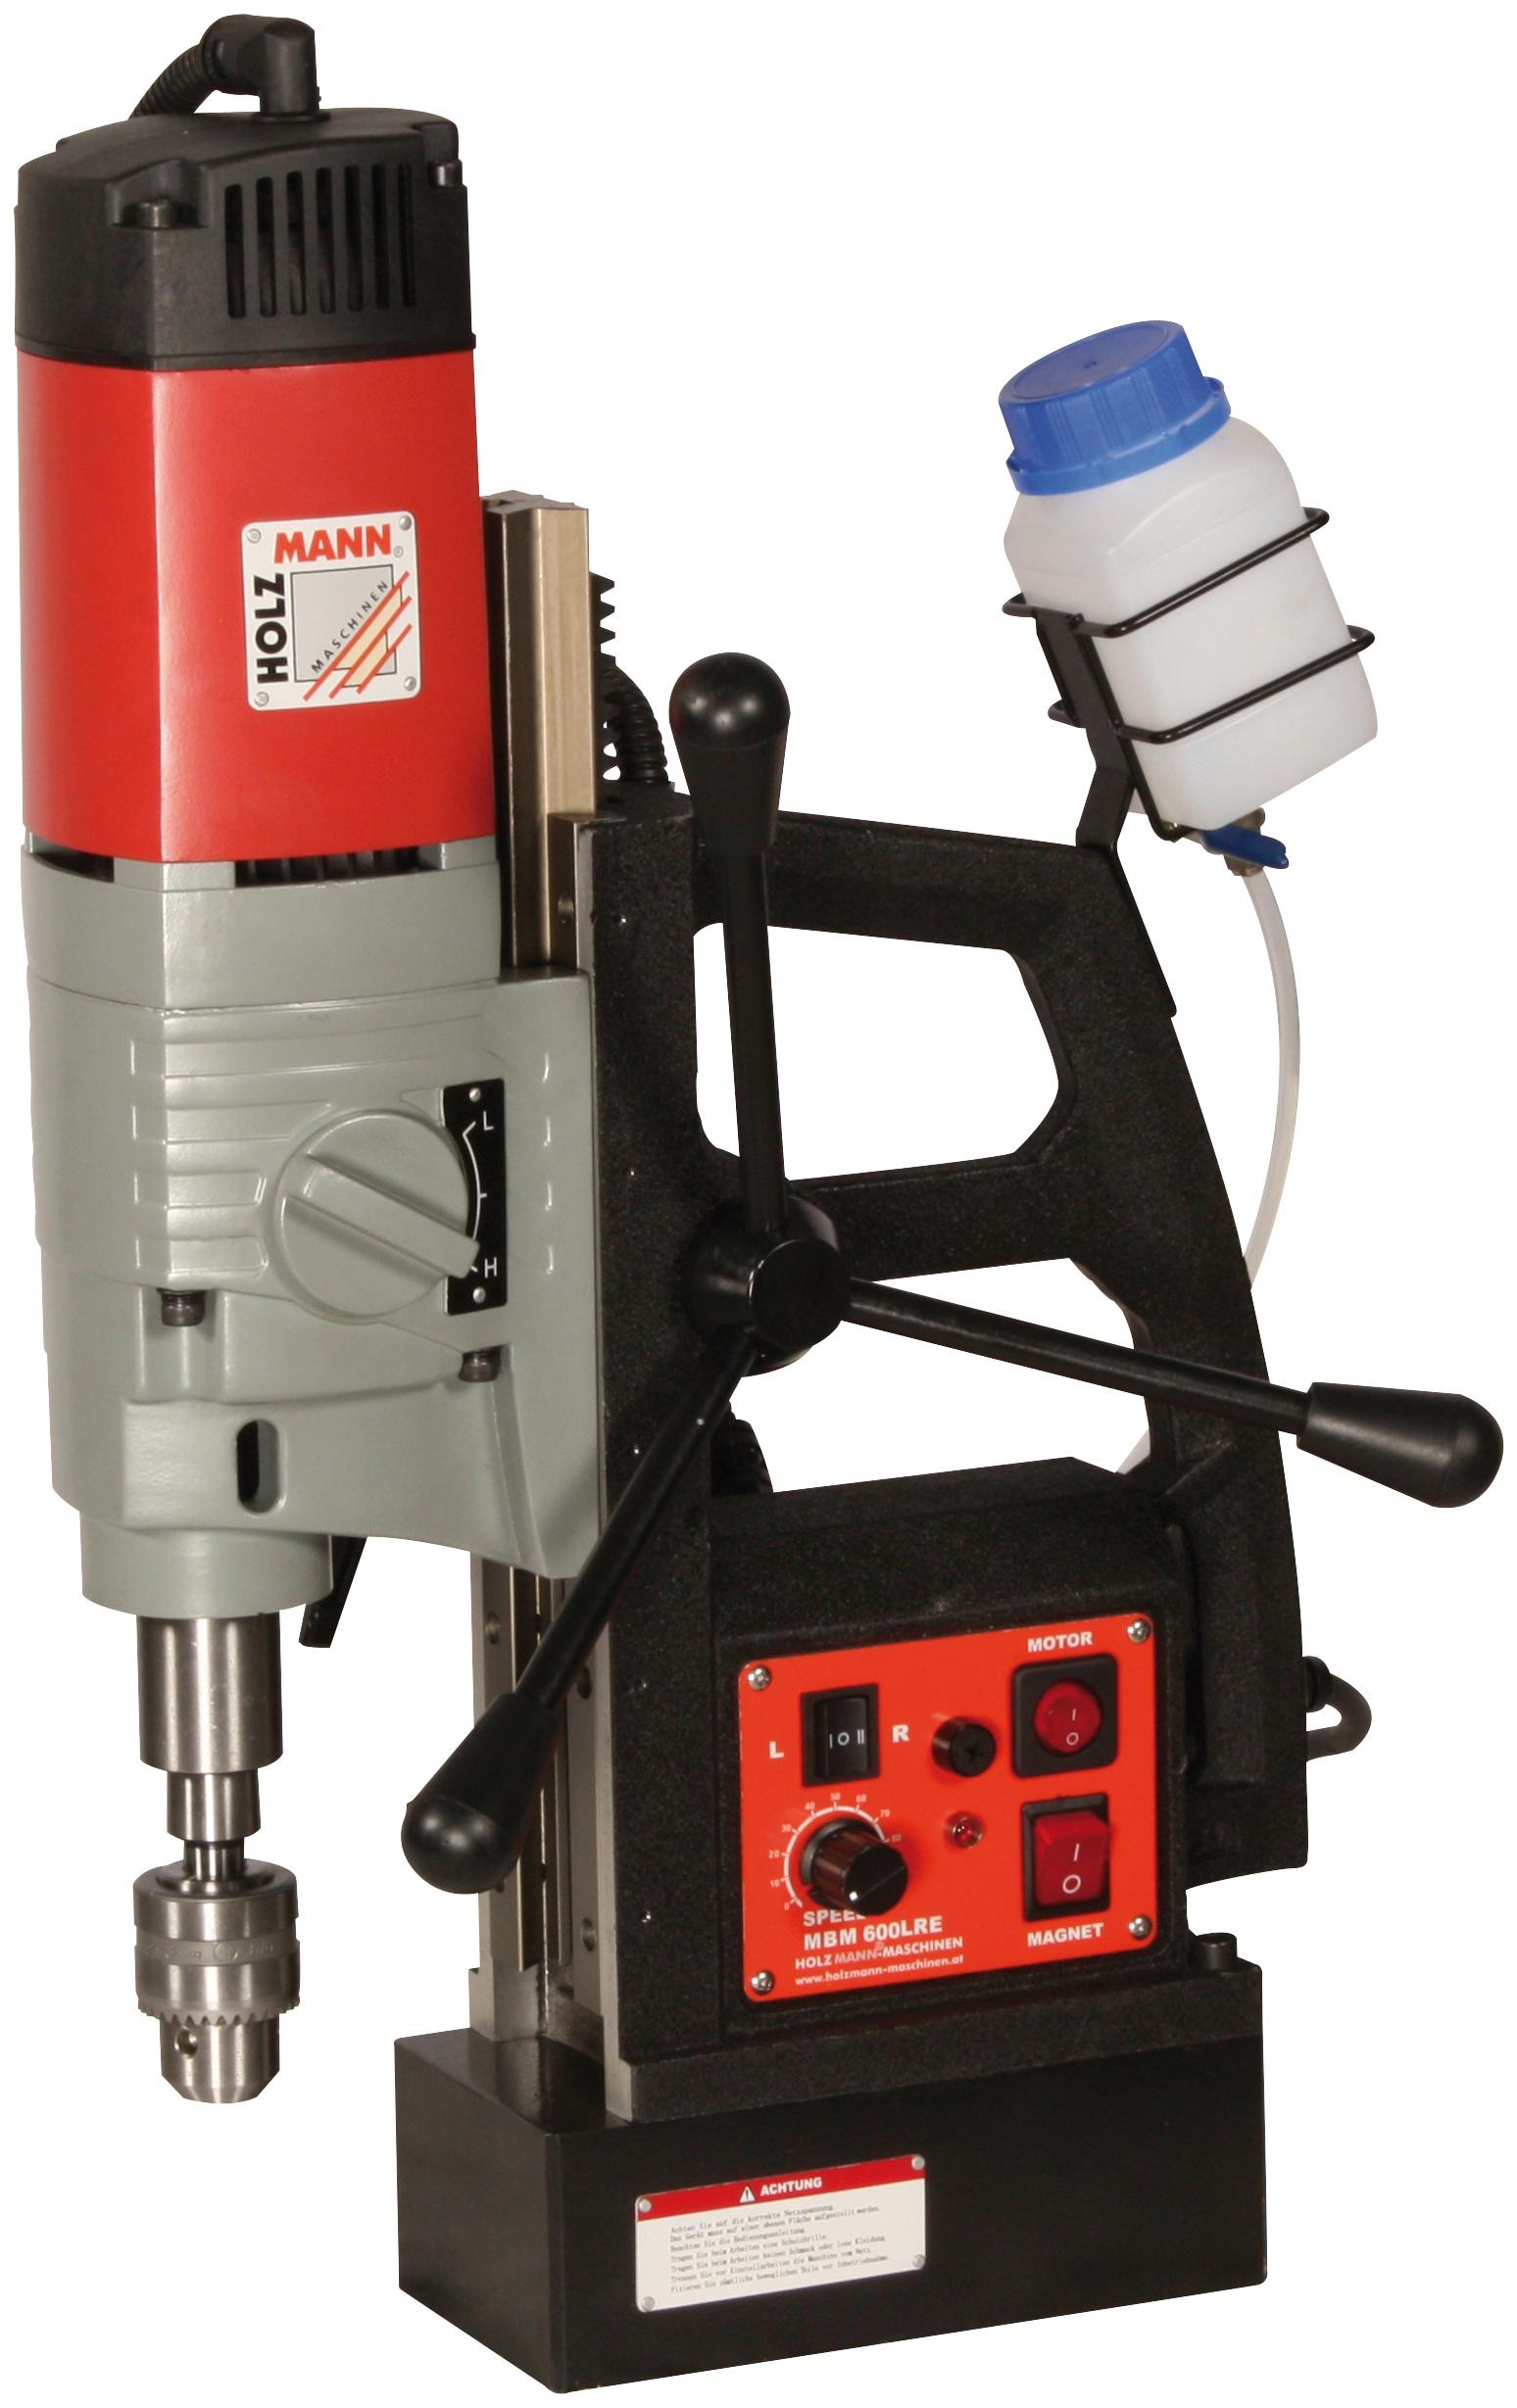 Holzmann Bohrmaschine MBM600LRE 230V